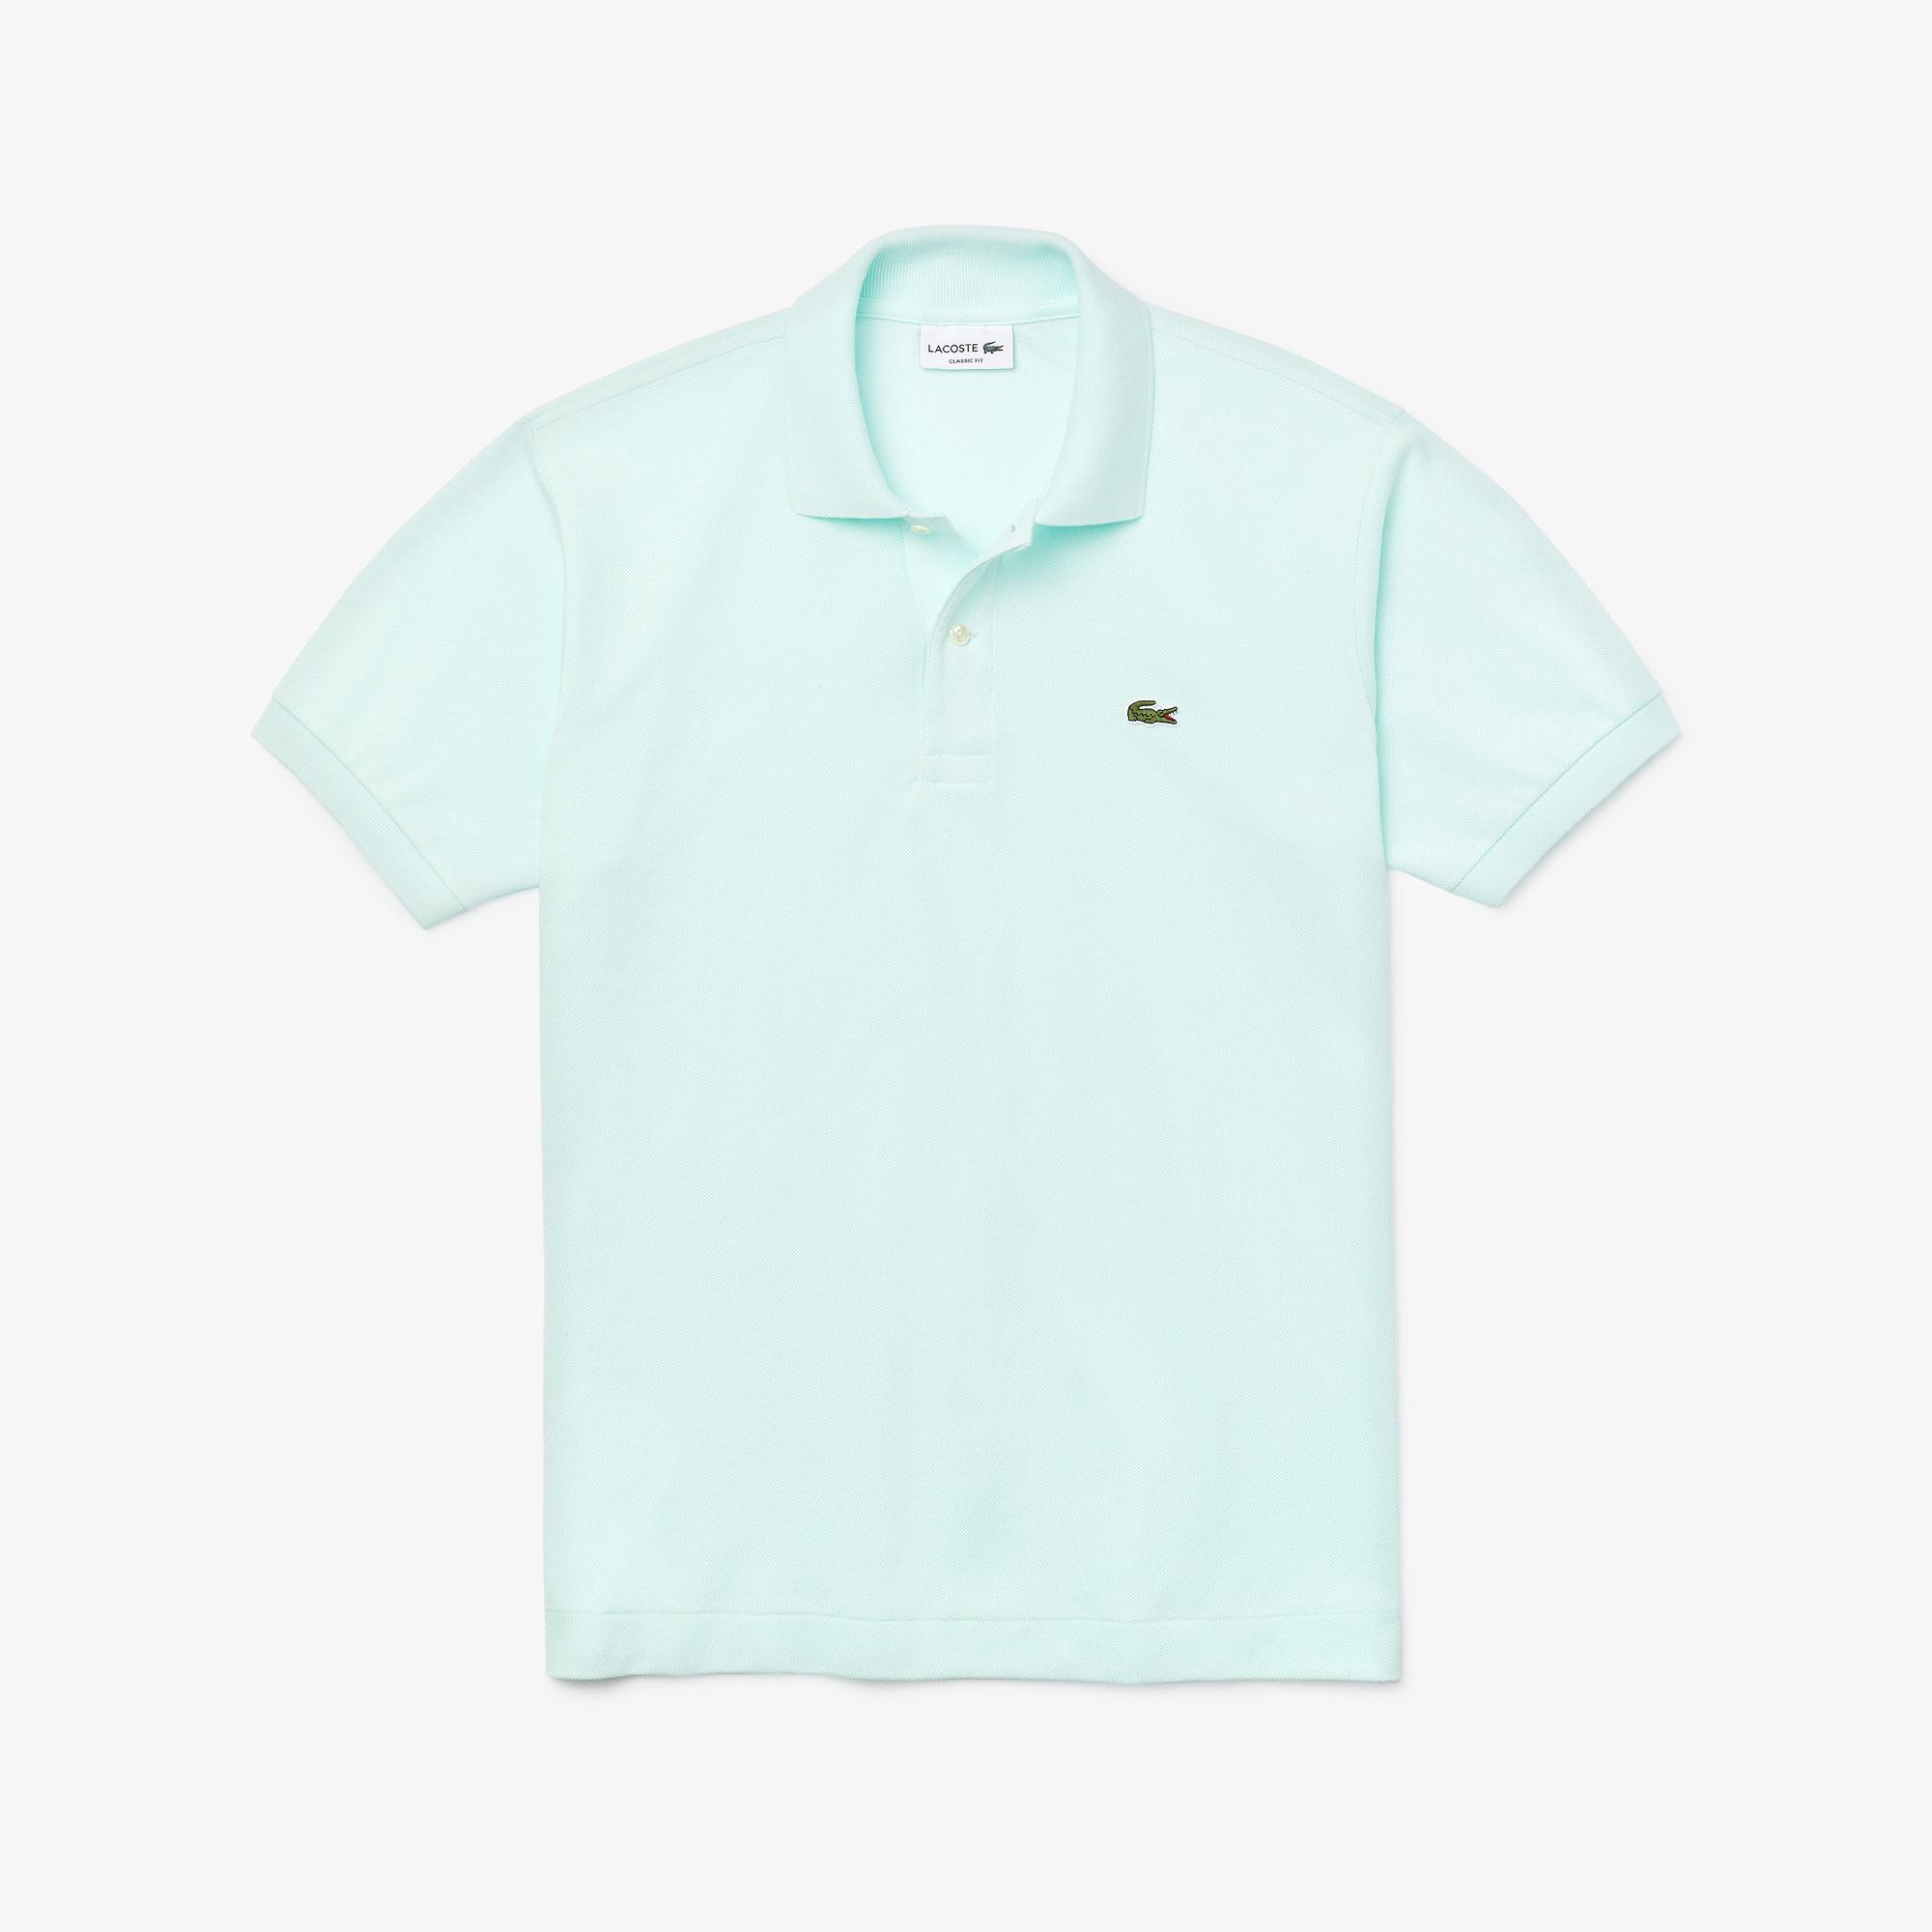 Lacoste Classic Fit L.12.12 Polo